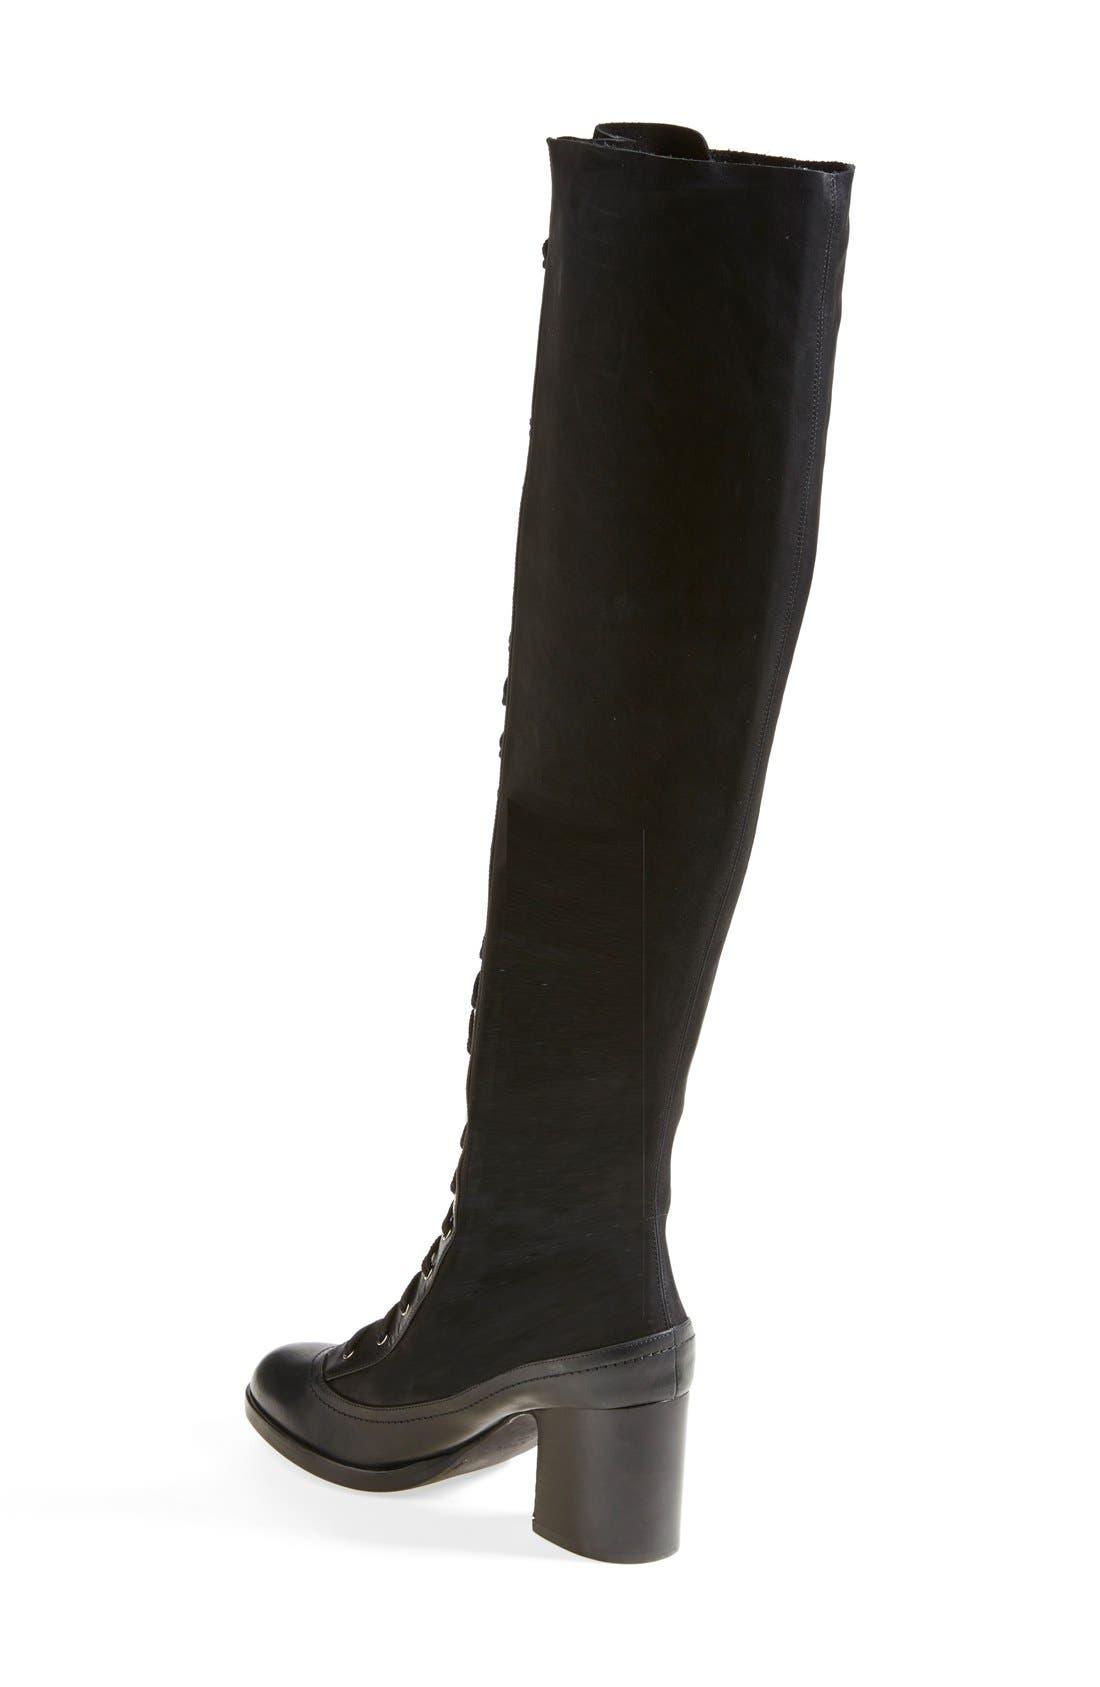 Alternate Image 2  - Rag & Bone 'Acton' Knee High Boot (Women)